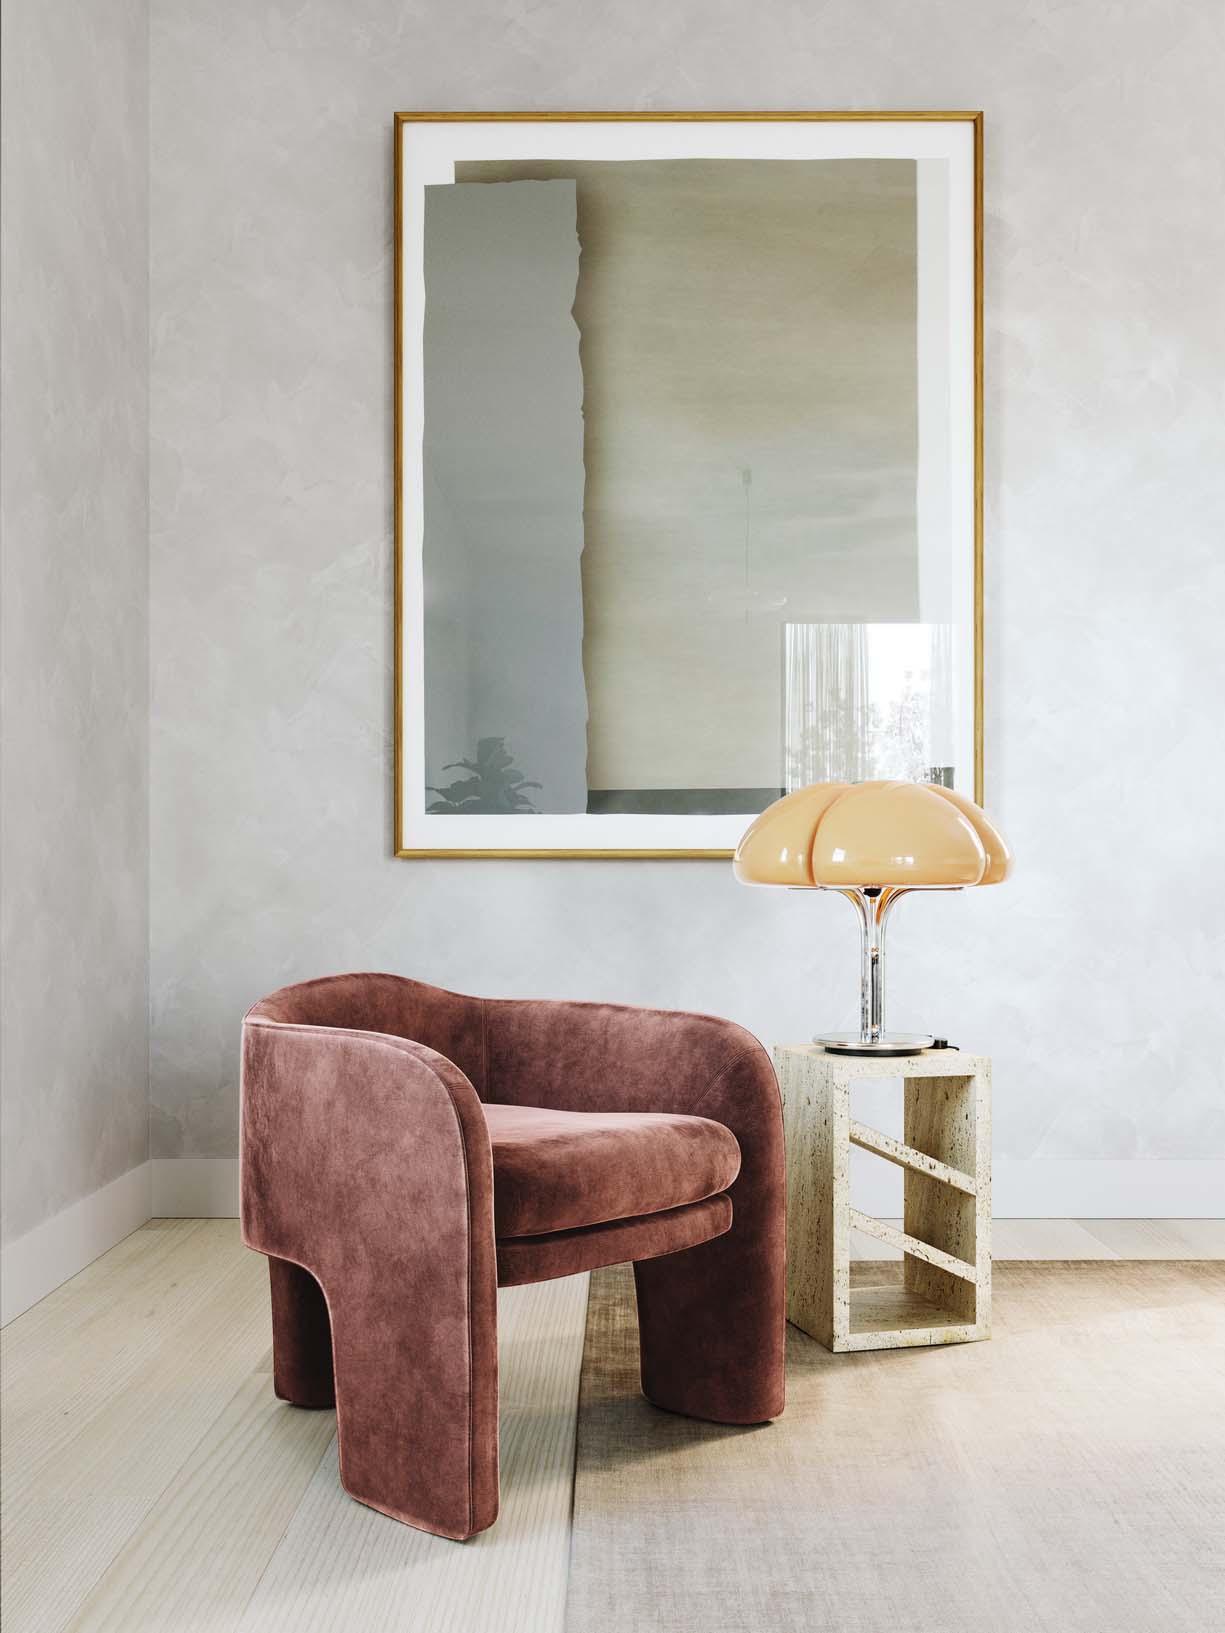 C&L-Residencies-Collingwood-3D-architectural-visualisation-sitting-room-FKD-Studio